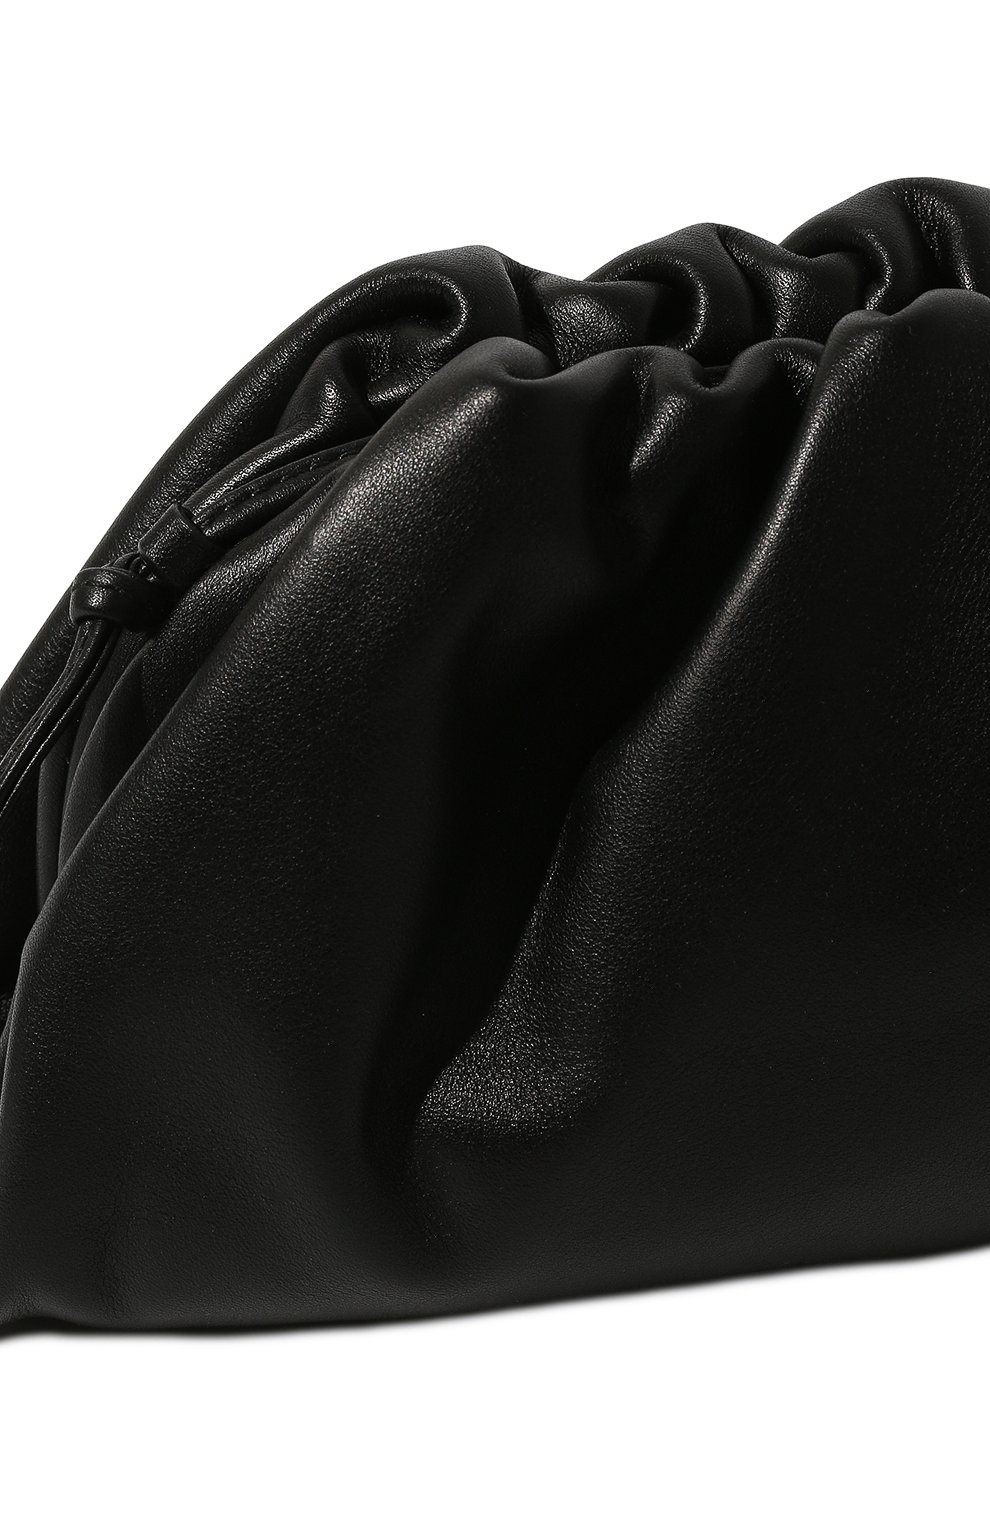 Женский клатч pouch 20 BOTTEGA VENETA черного цвета, арт. 585852/VCP40 | Фото 2